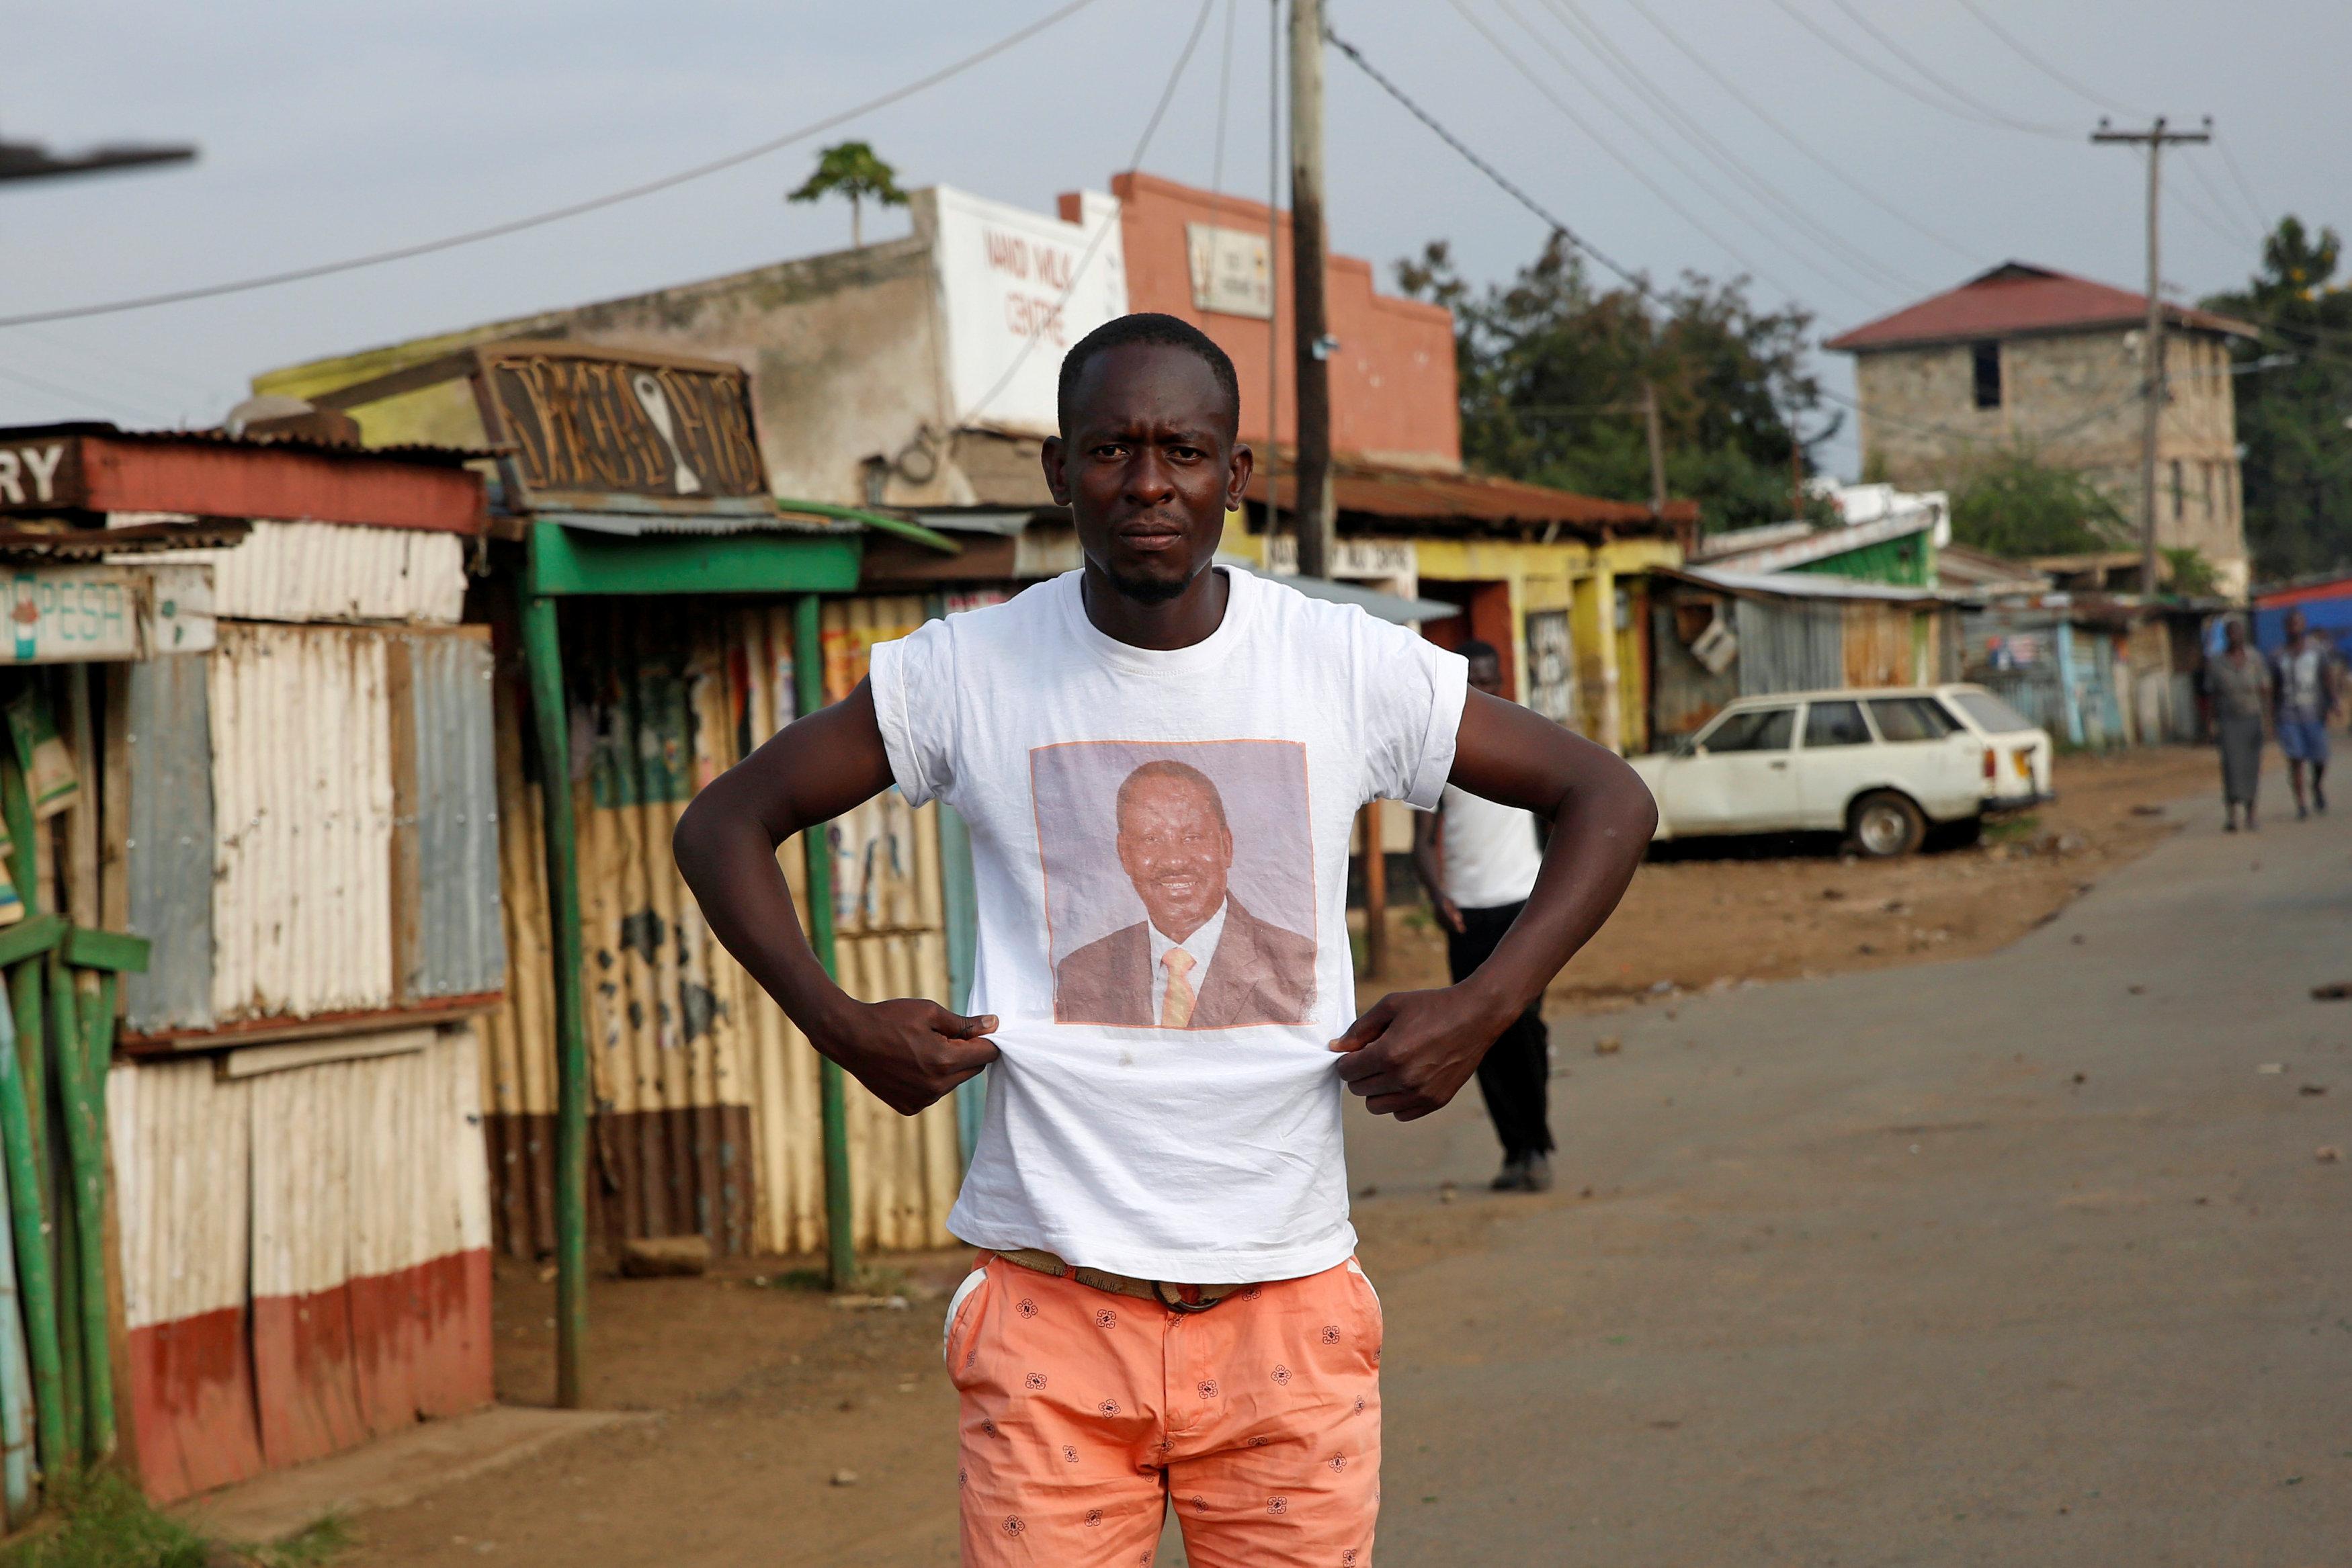 In pictures: Violence erupts in Kenya after polls